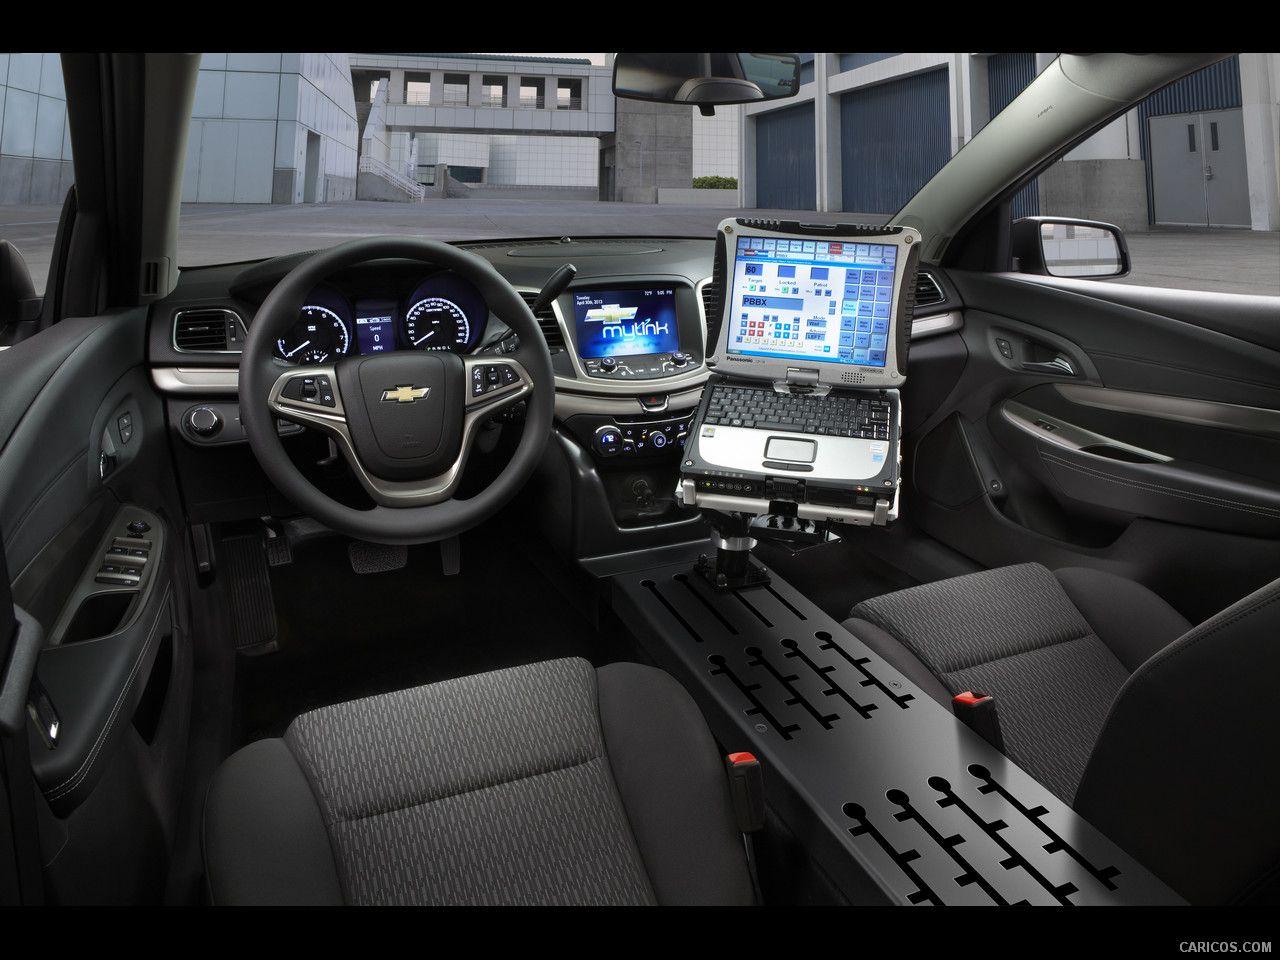 2014 Chevrolet Caprice Ppv Wallpaper Chevrolet Caprice Caprice